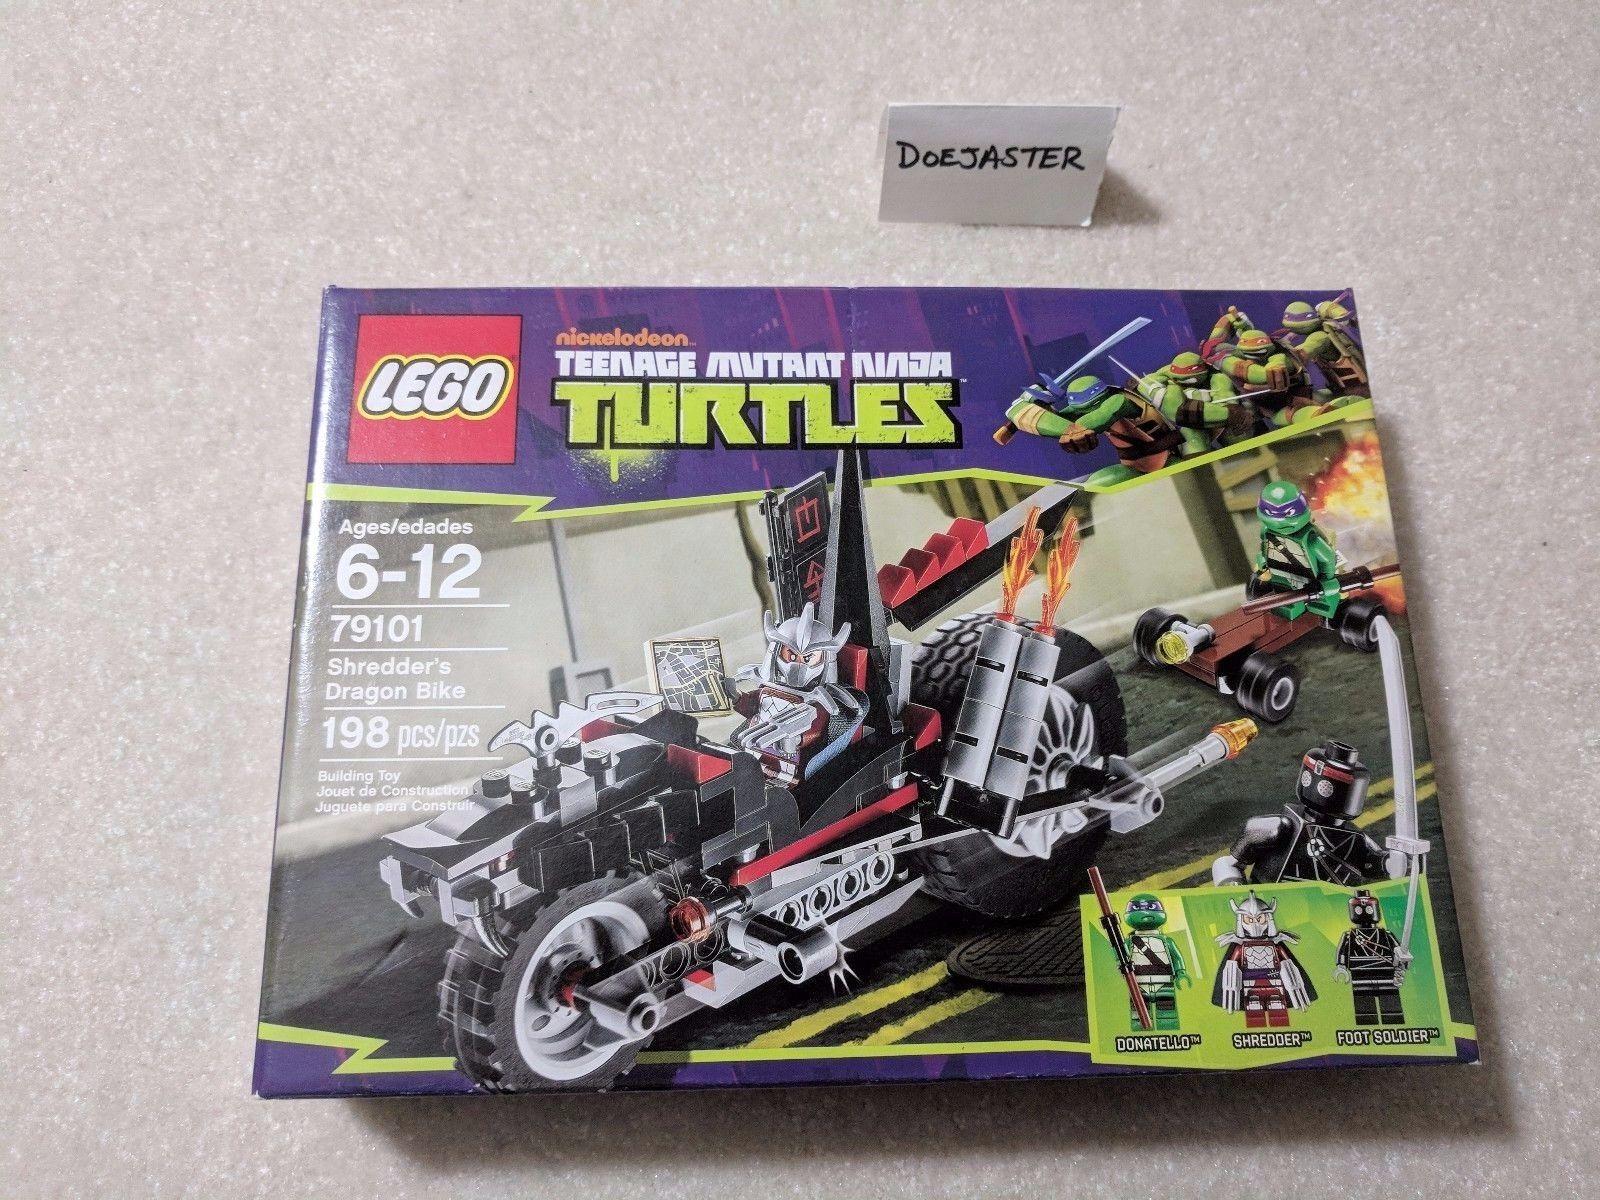 LEGO (79101) ShROTder's Dragon Bike - 2013 - Teenage Mutant Ninja Turtles